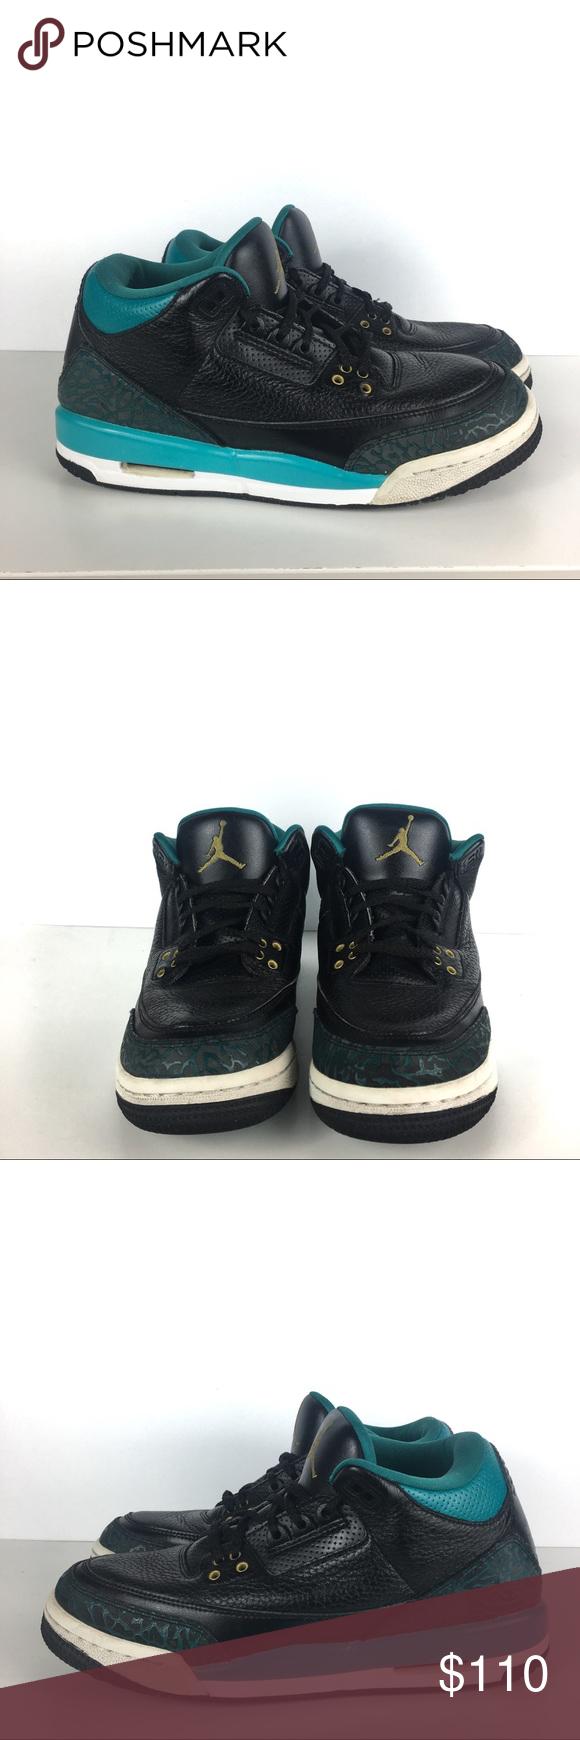 timeless design ec4ab 69ea8 Jordan Shoes | Air Jordan Retro 3 Jacksonville Jaguars ...